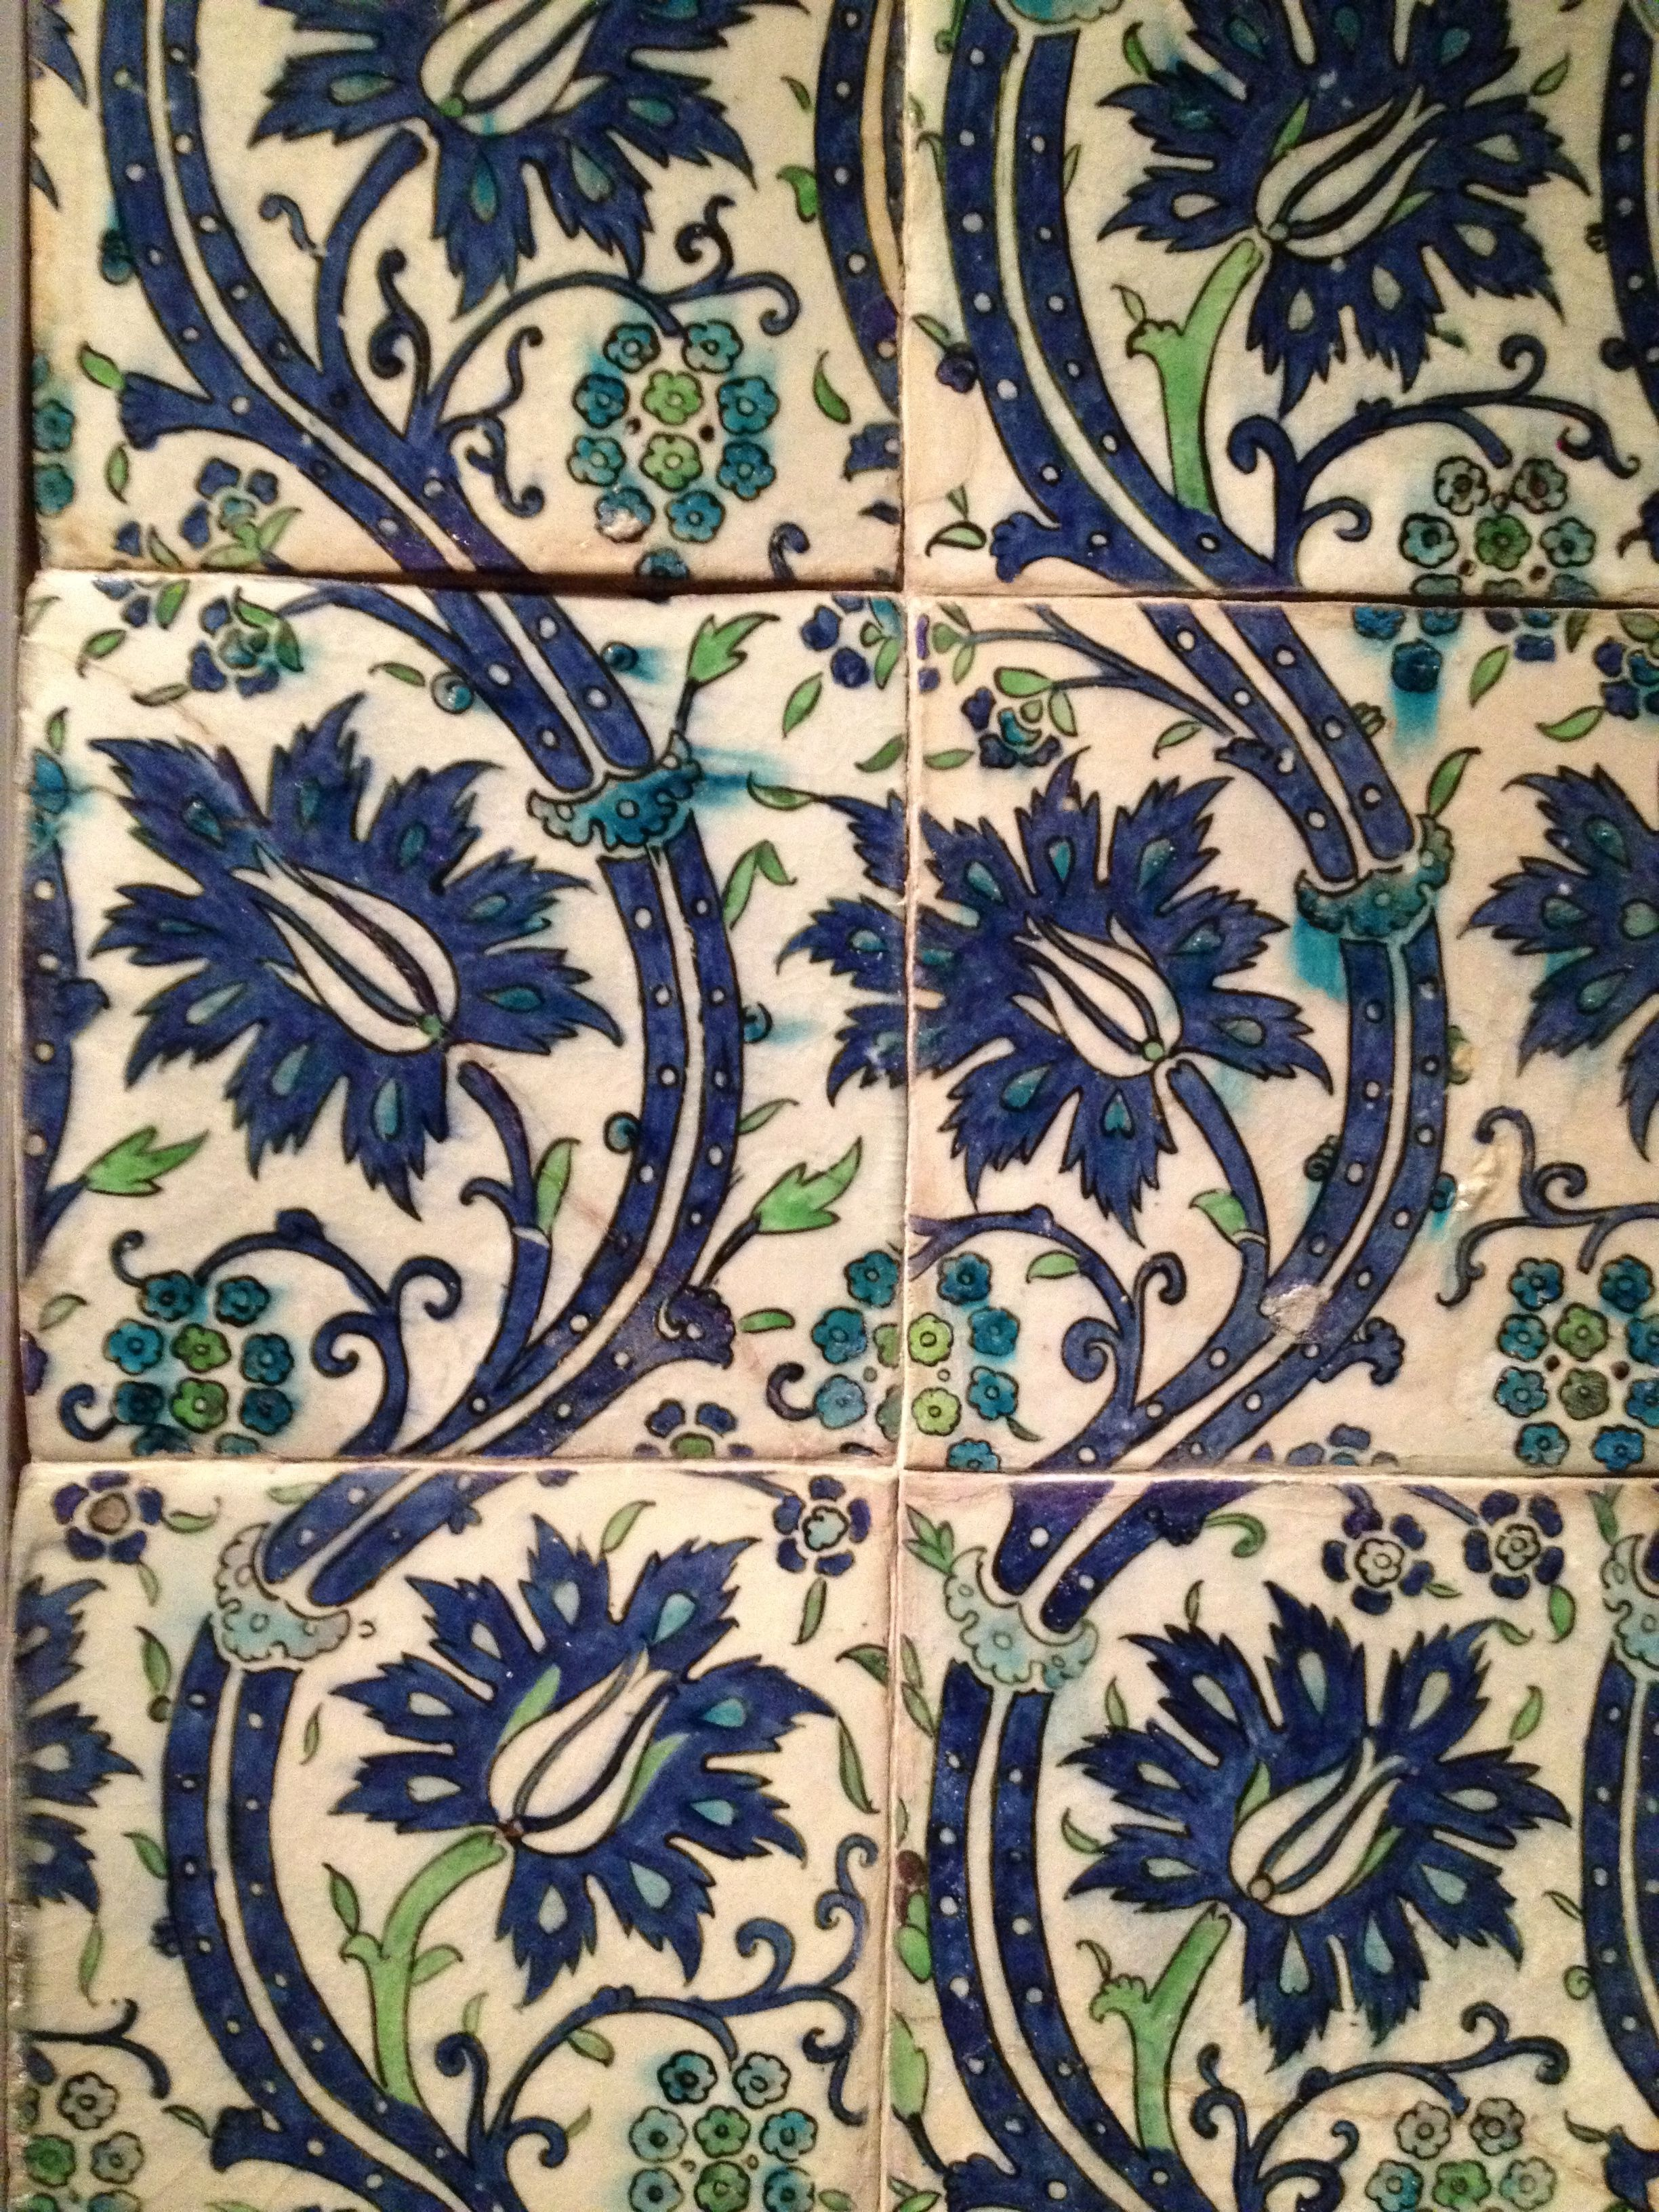 Persian Tile Pattern Tiles Pinterest Fliesen Mosaik Und Keramik - Türkische fliesen online